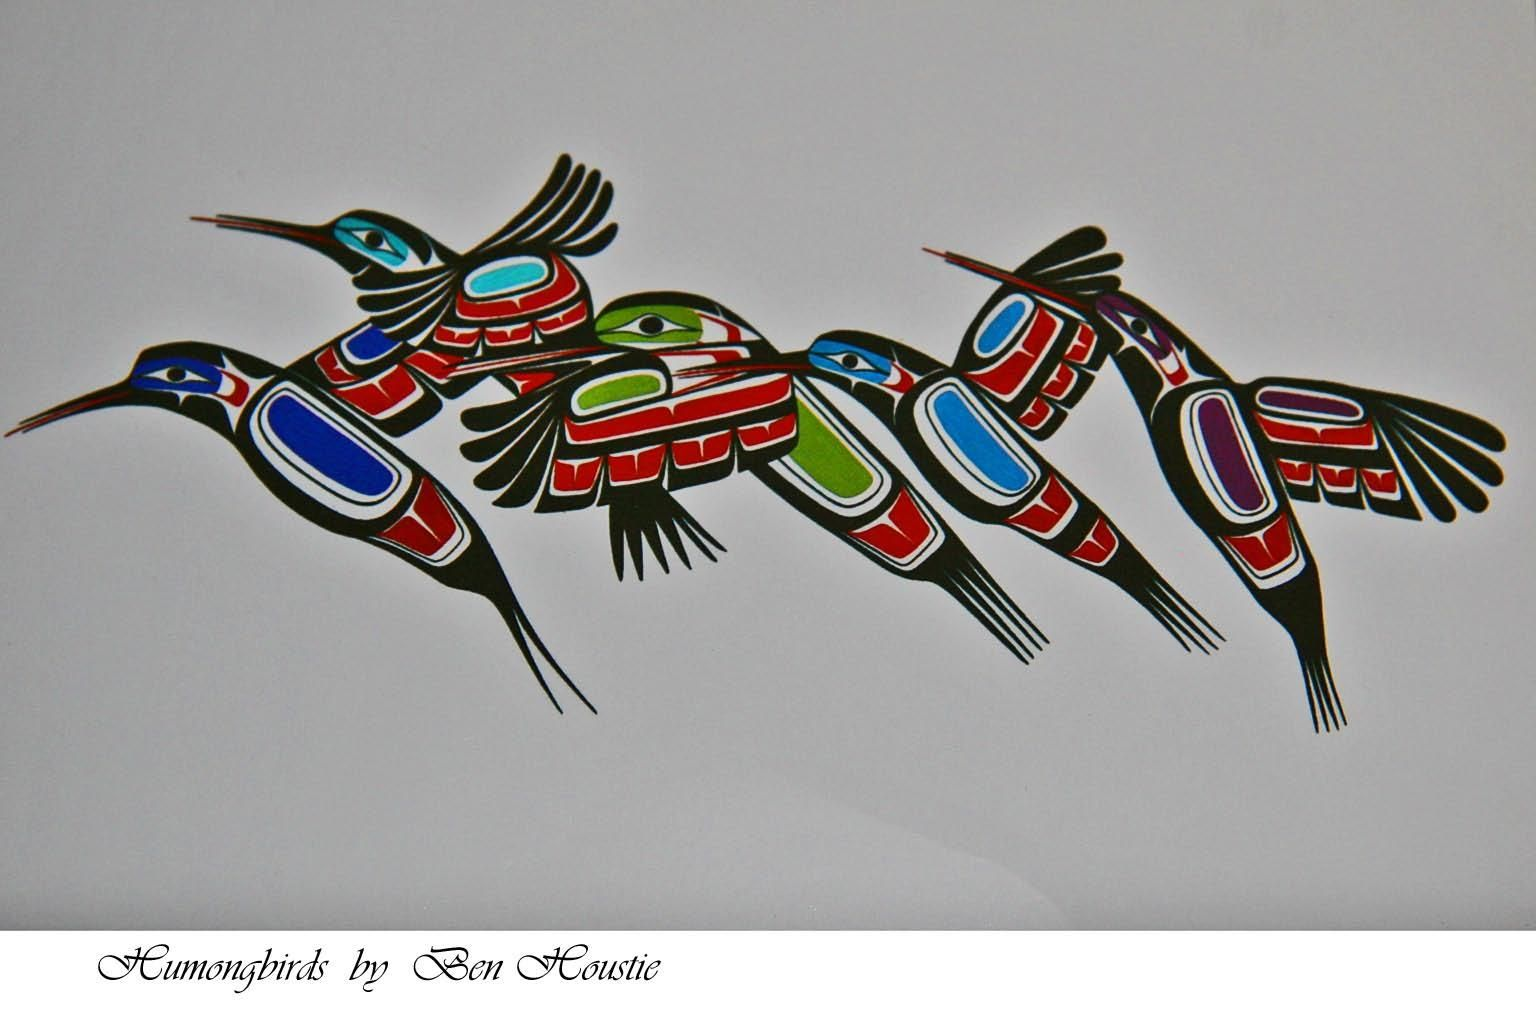 Hummingbirds by Ben Houstie Cavaliers logo, Team logo, Logos